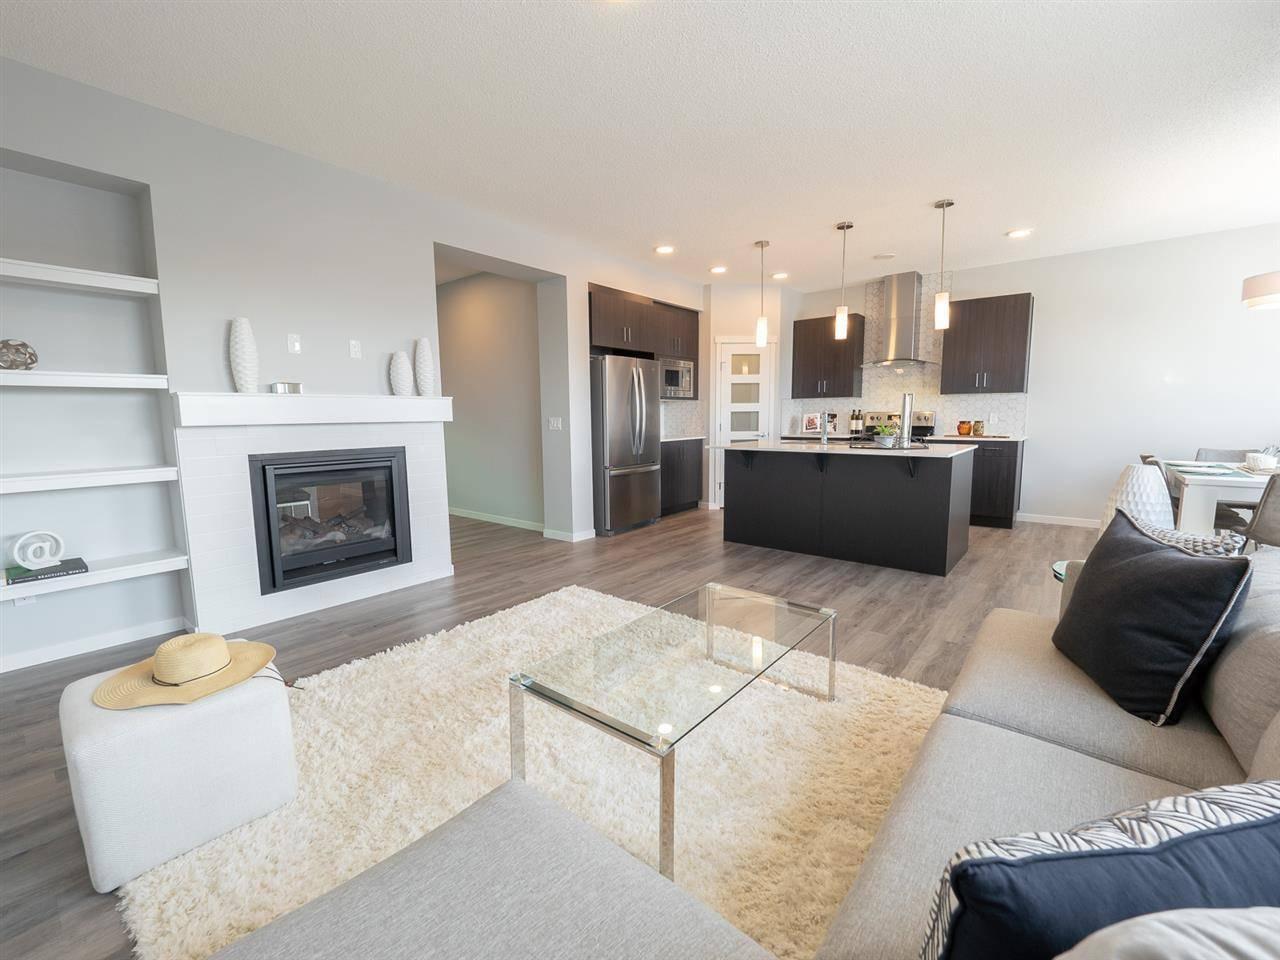 House for sale at 2436 Wonnacott Ct Sw Edmonton Alberta - MLS: E4186458